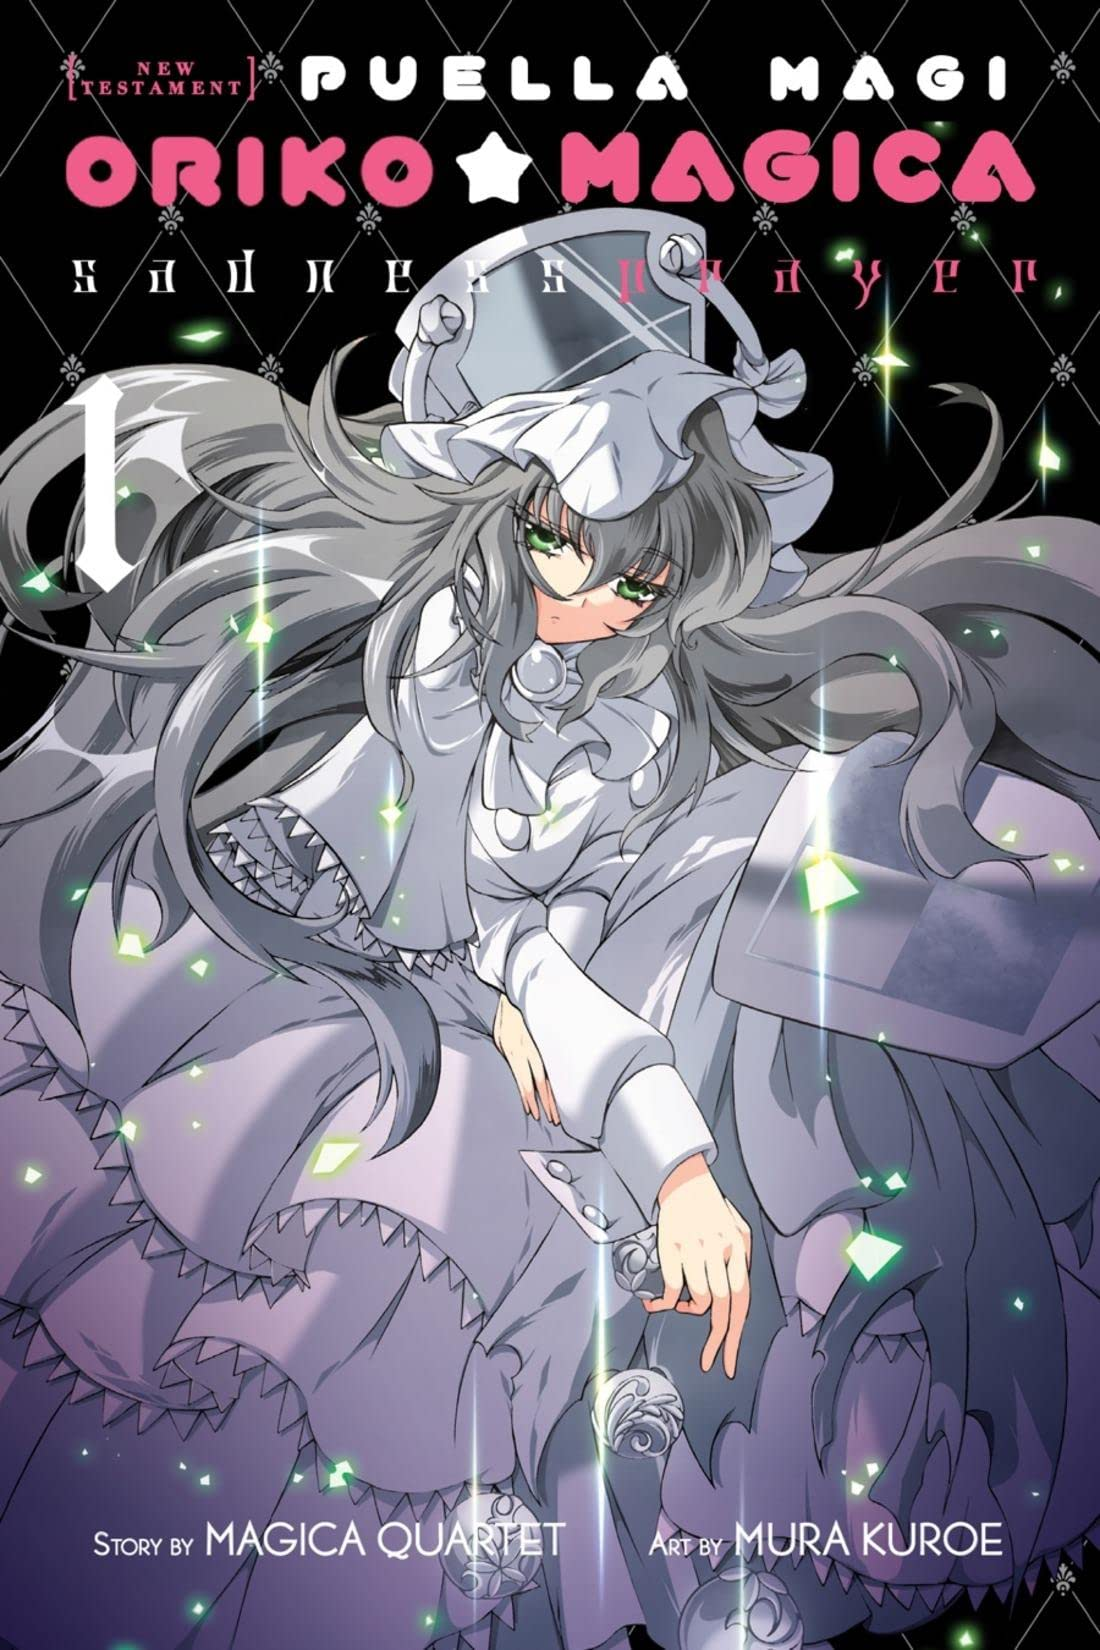 Puella Magi Oriko Magica Vol. 1: Sadness Prayer